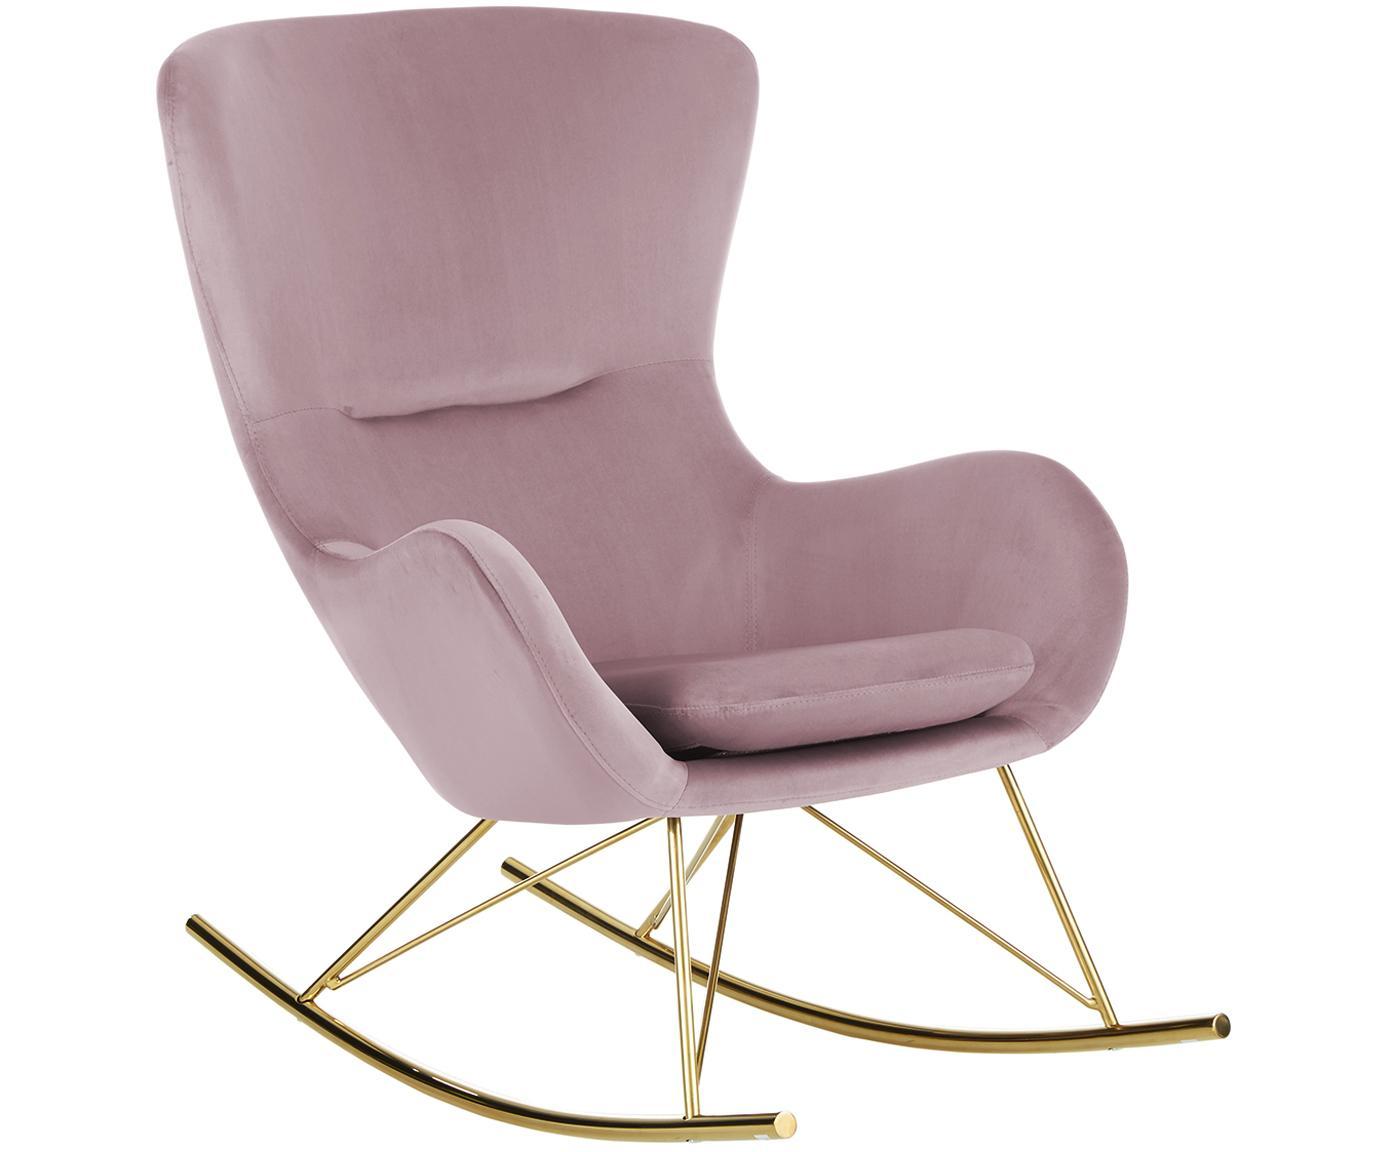 MecedoraWing, Tapizado: terciopelo (poliéster) 15, Estructura: metal brillante, Tapizado: rosa Estructura: dorado, brillante, An 77 x F 96 cm